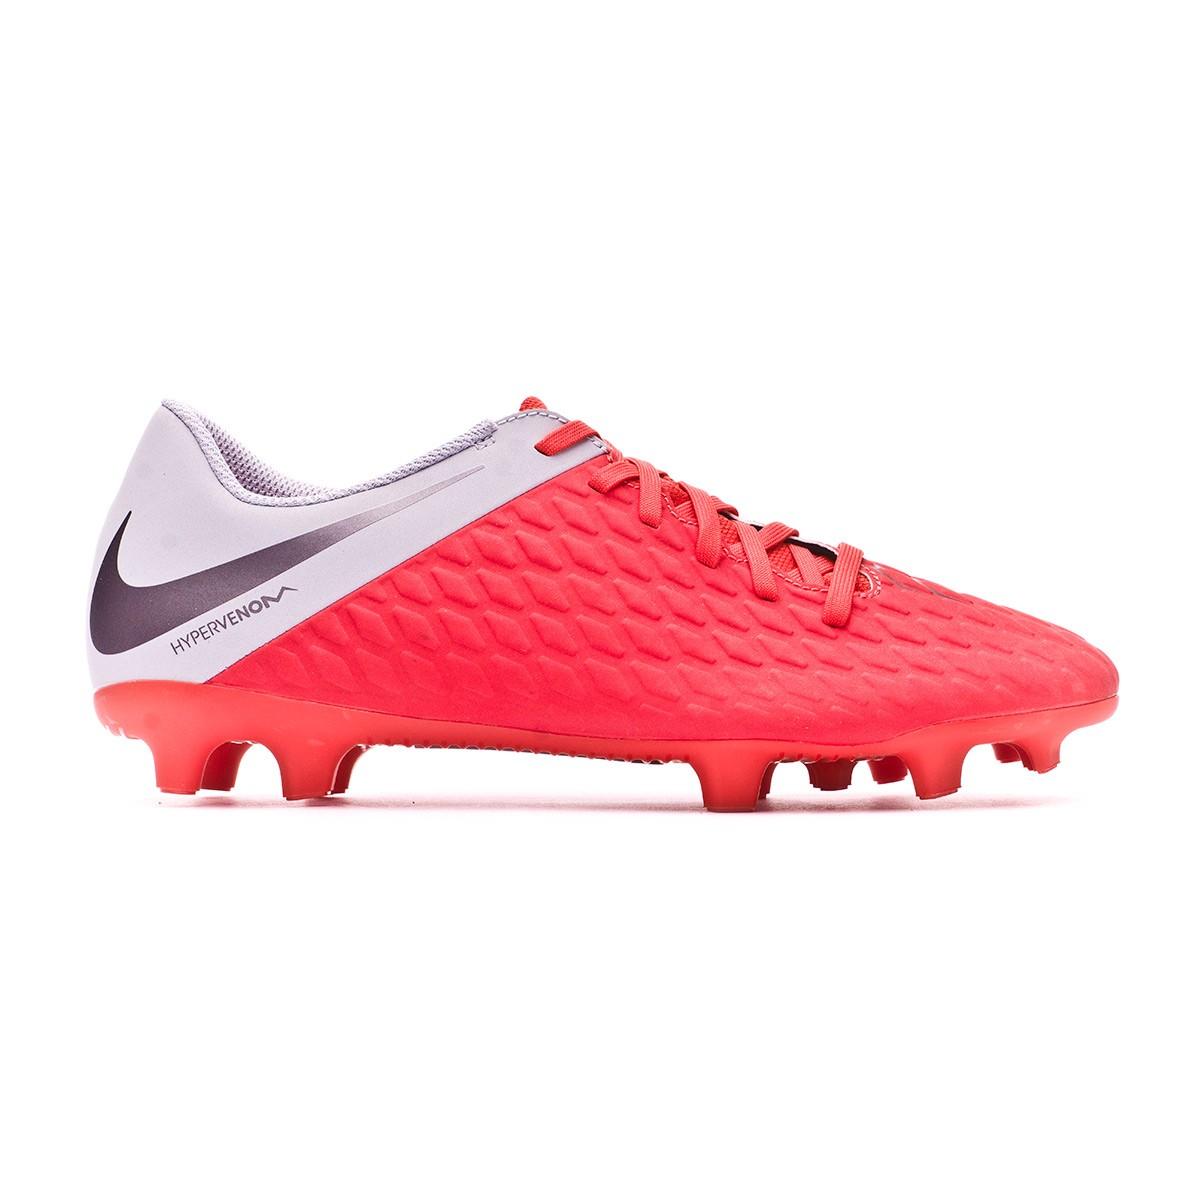 0c5b54271e9 Football Boots Nike Hypervenom Phantom III Club FG Light crimson-Metallic  dark grey-Wolf grey - Tienda de fútbol Fútbol Emotion